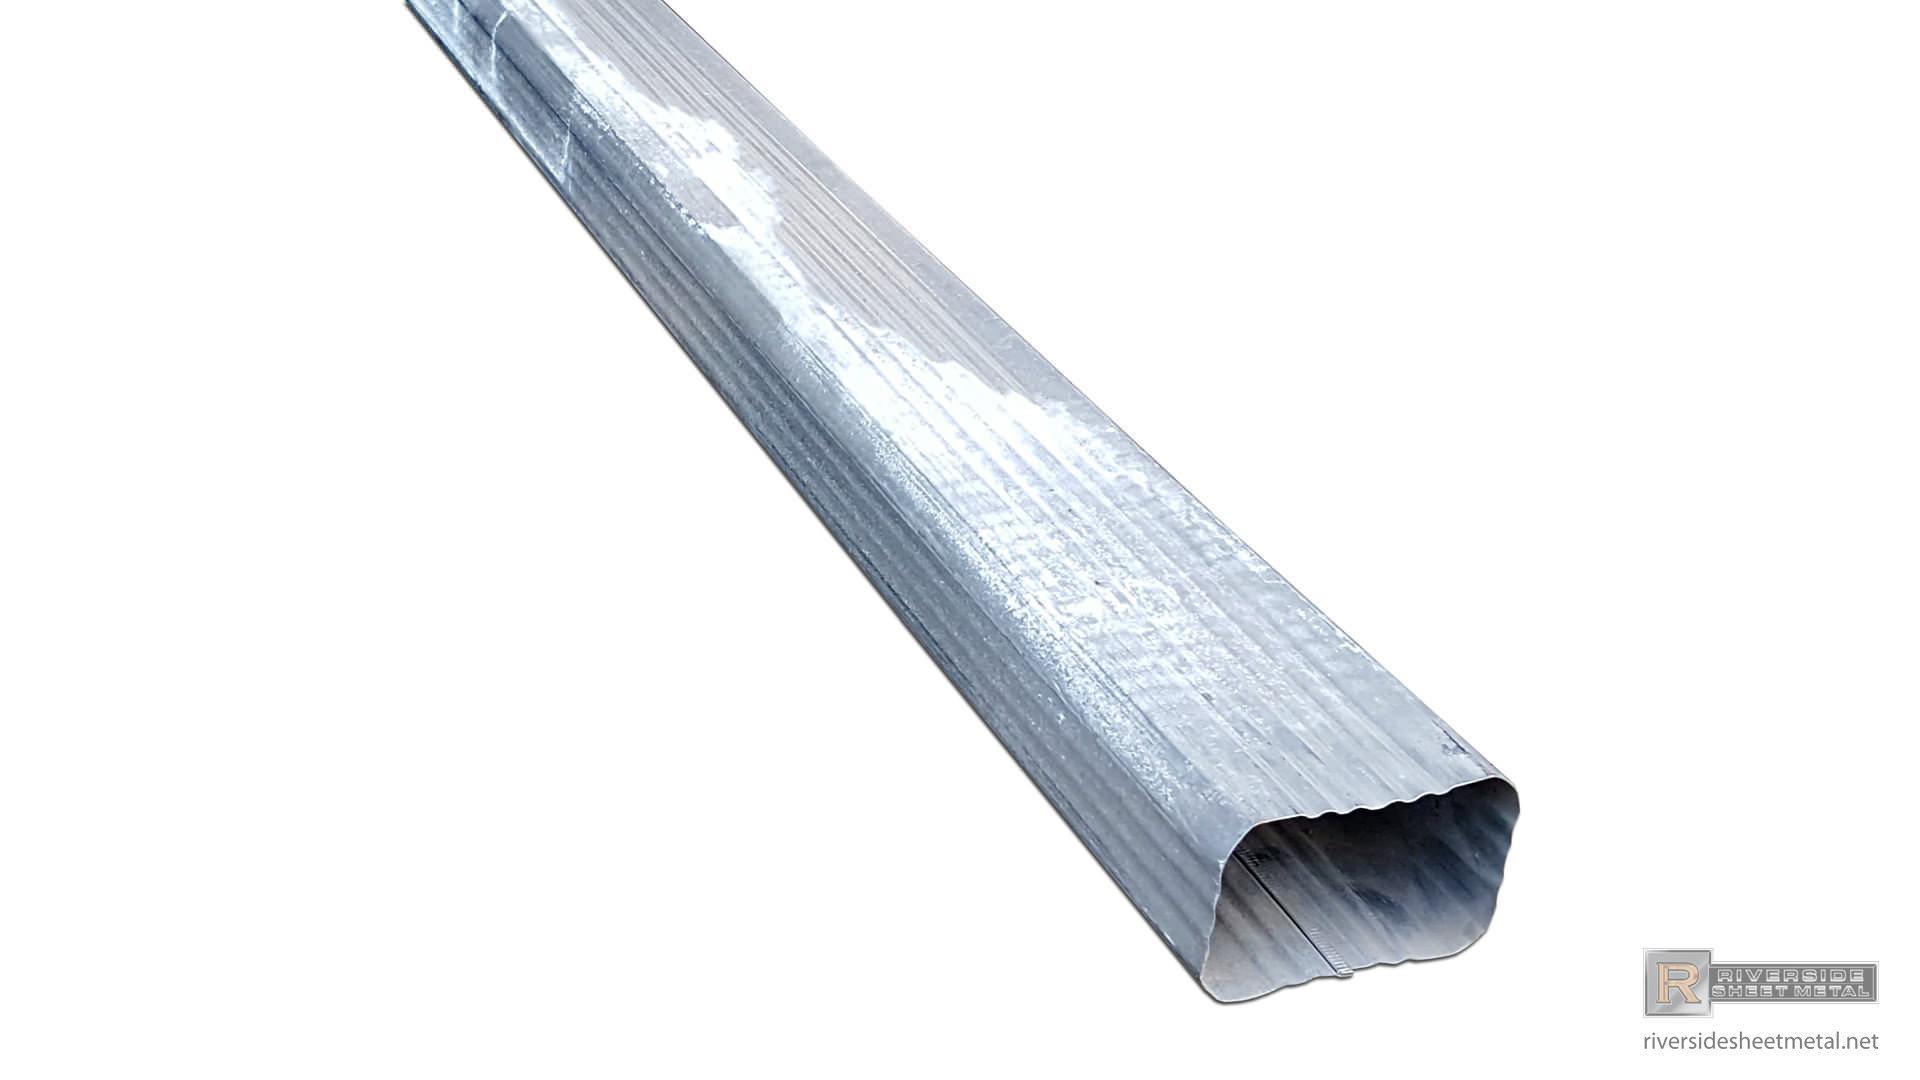 Corrugated Aluminum Or Copper Gutter Downspout 2 Quot X 3